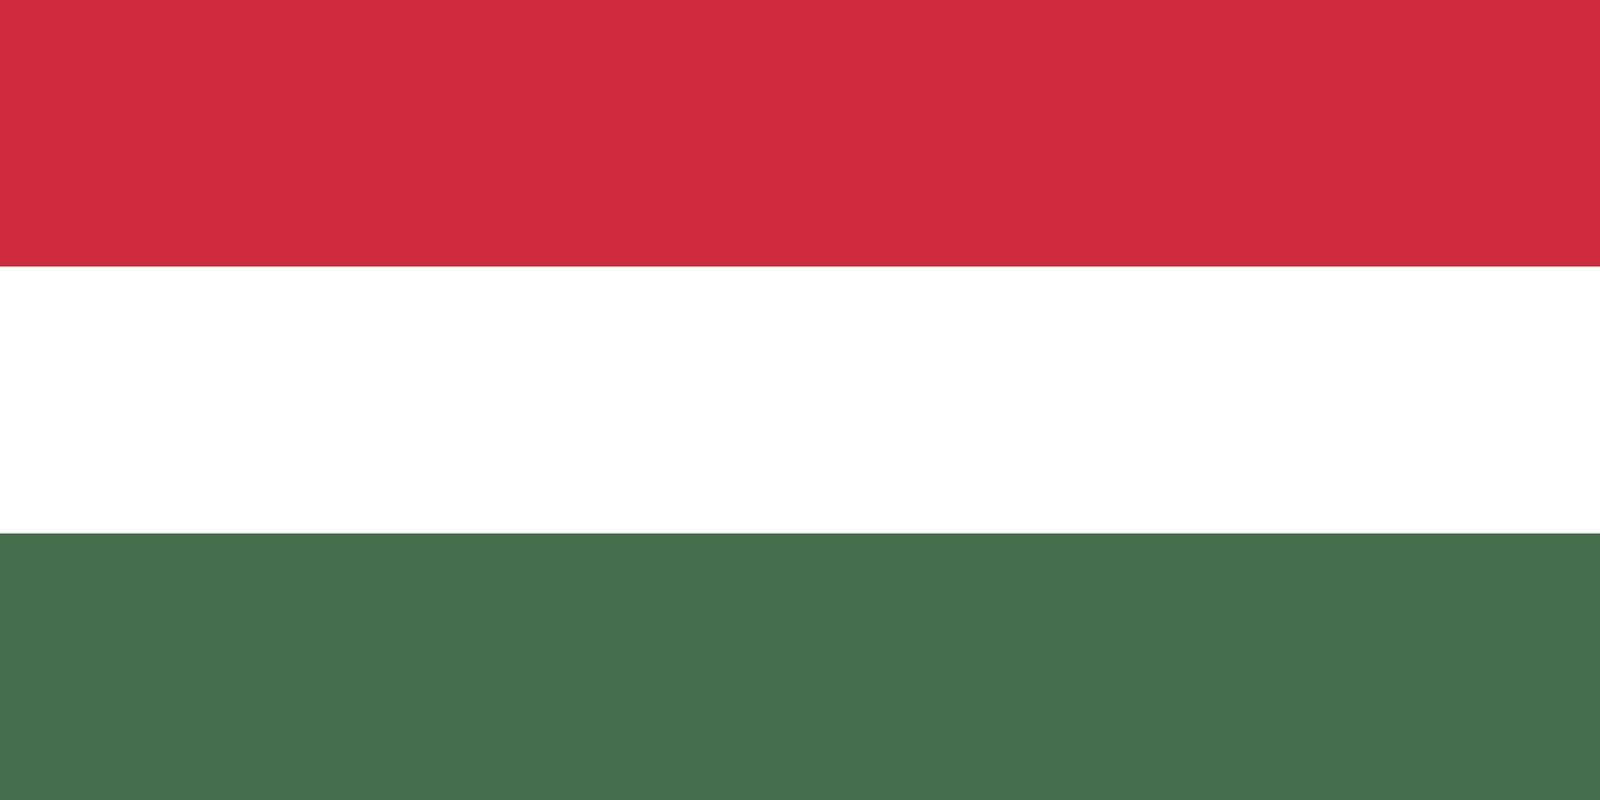 http://carbrandsincurrentproduction.blogspot.com.es/search/label/Hungary